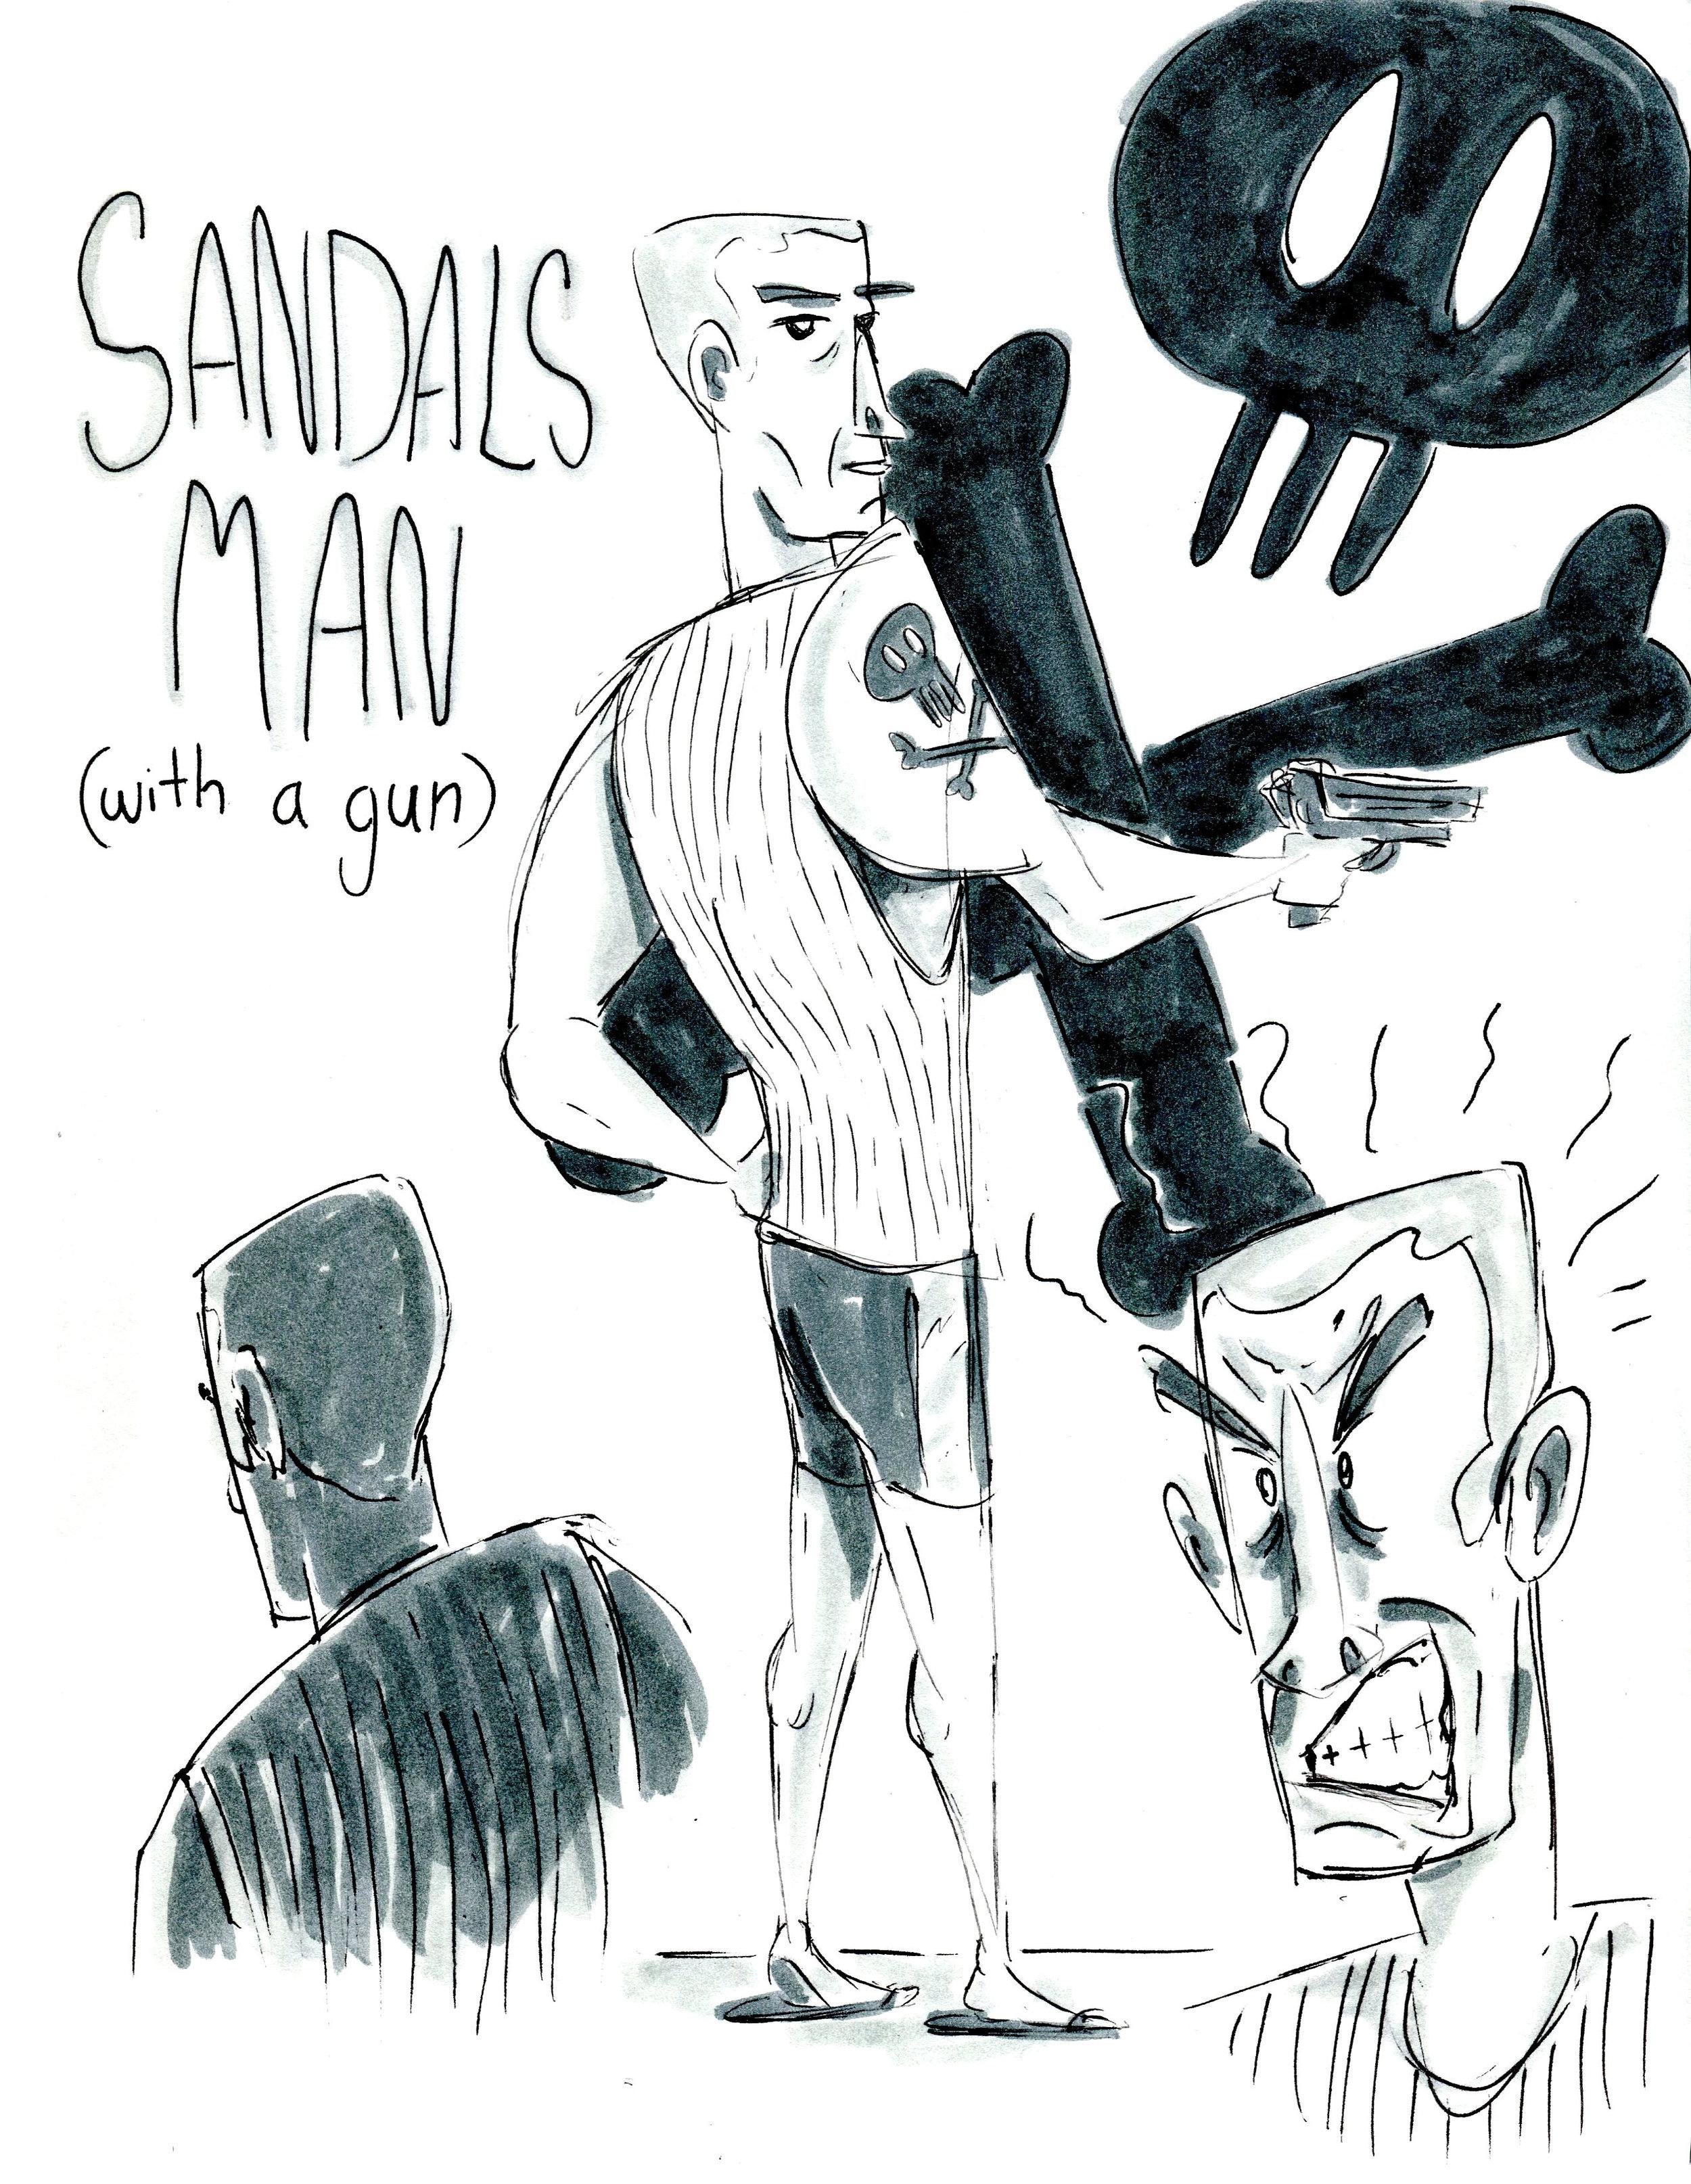 sandals man with a gun.jpg